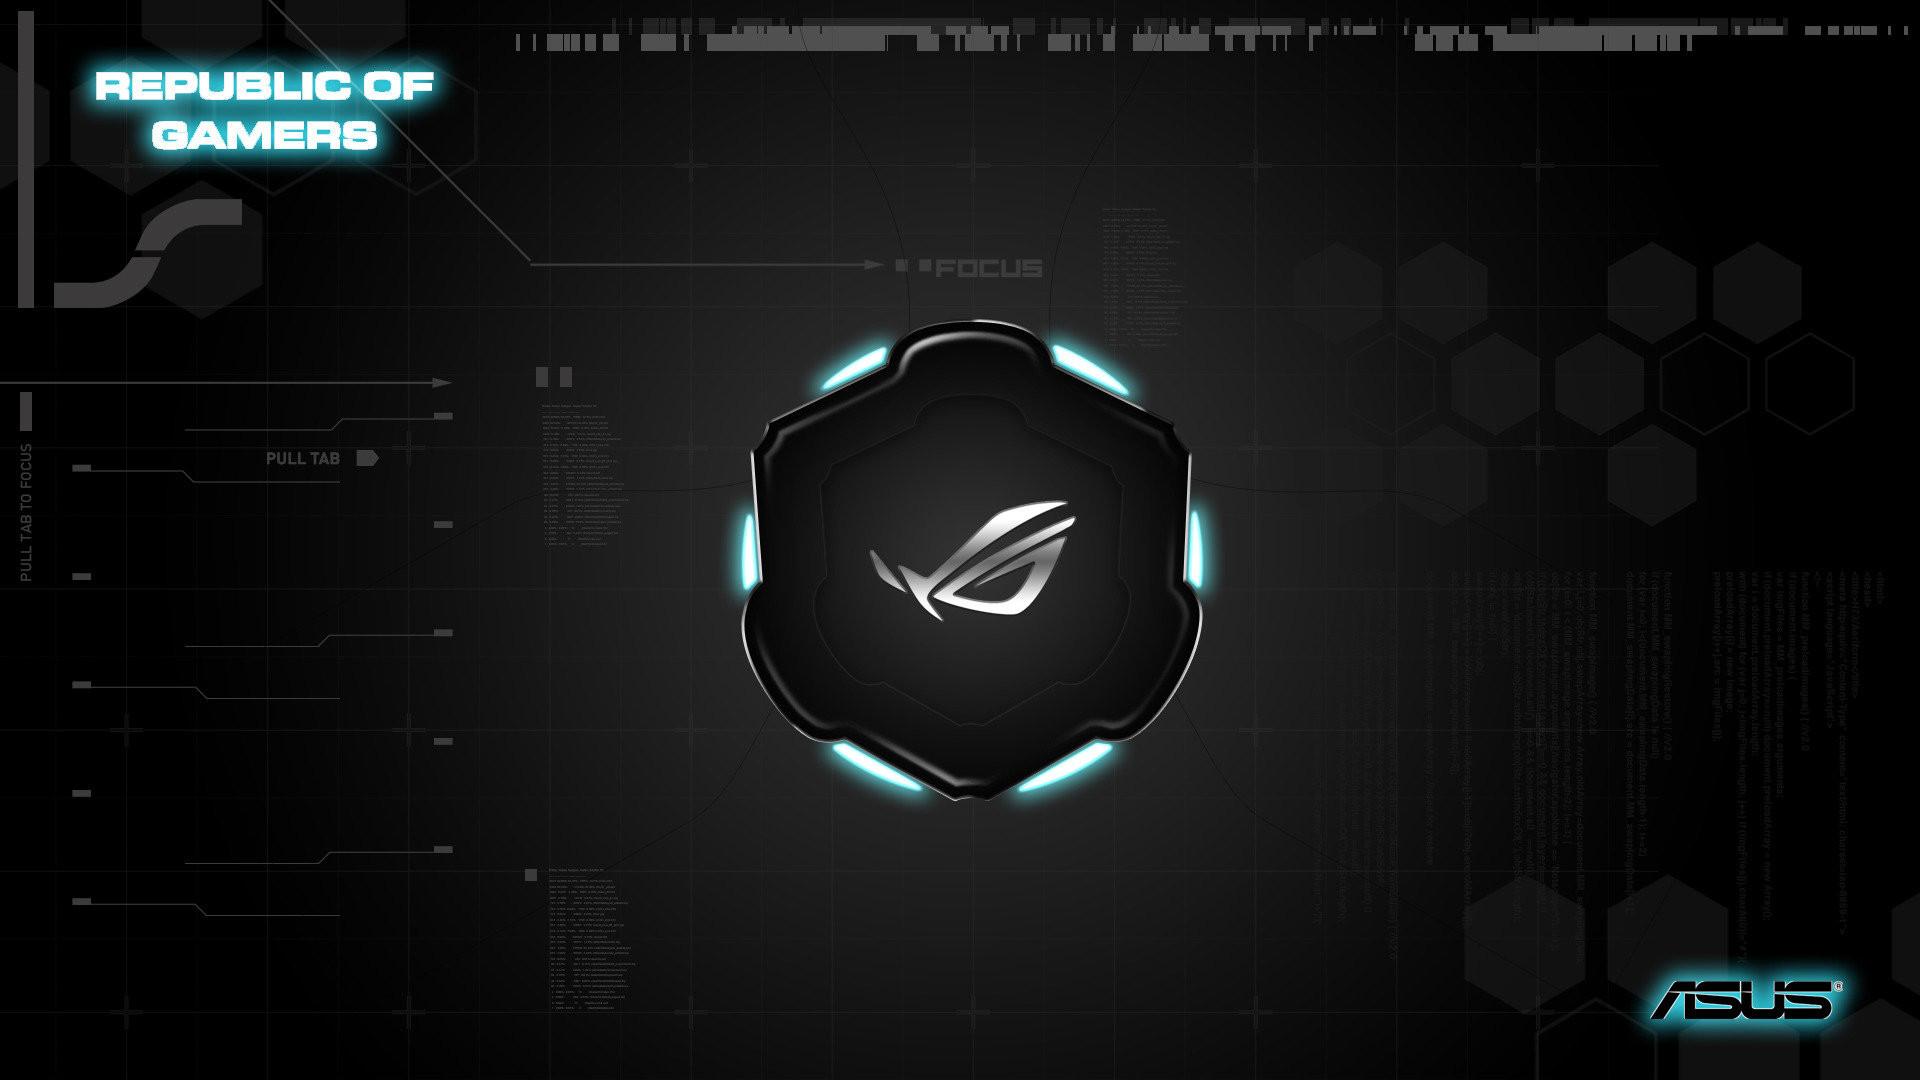 JayCee – Futuristic Technology